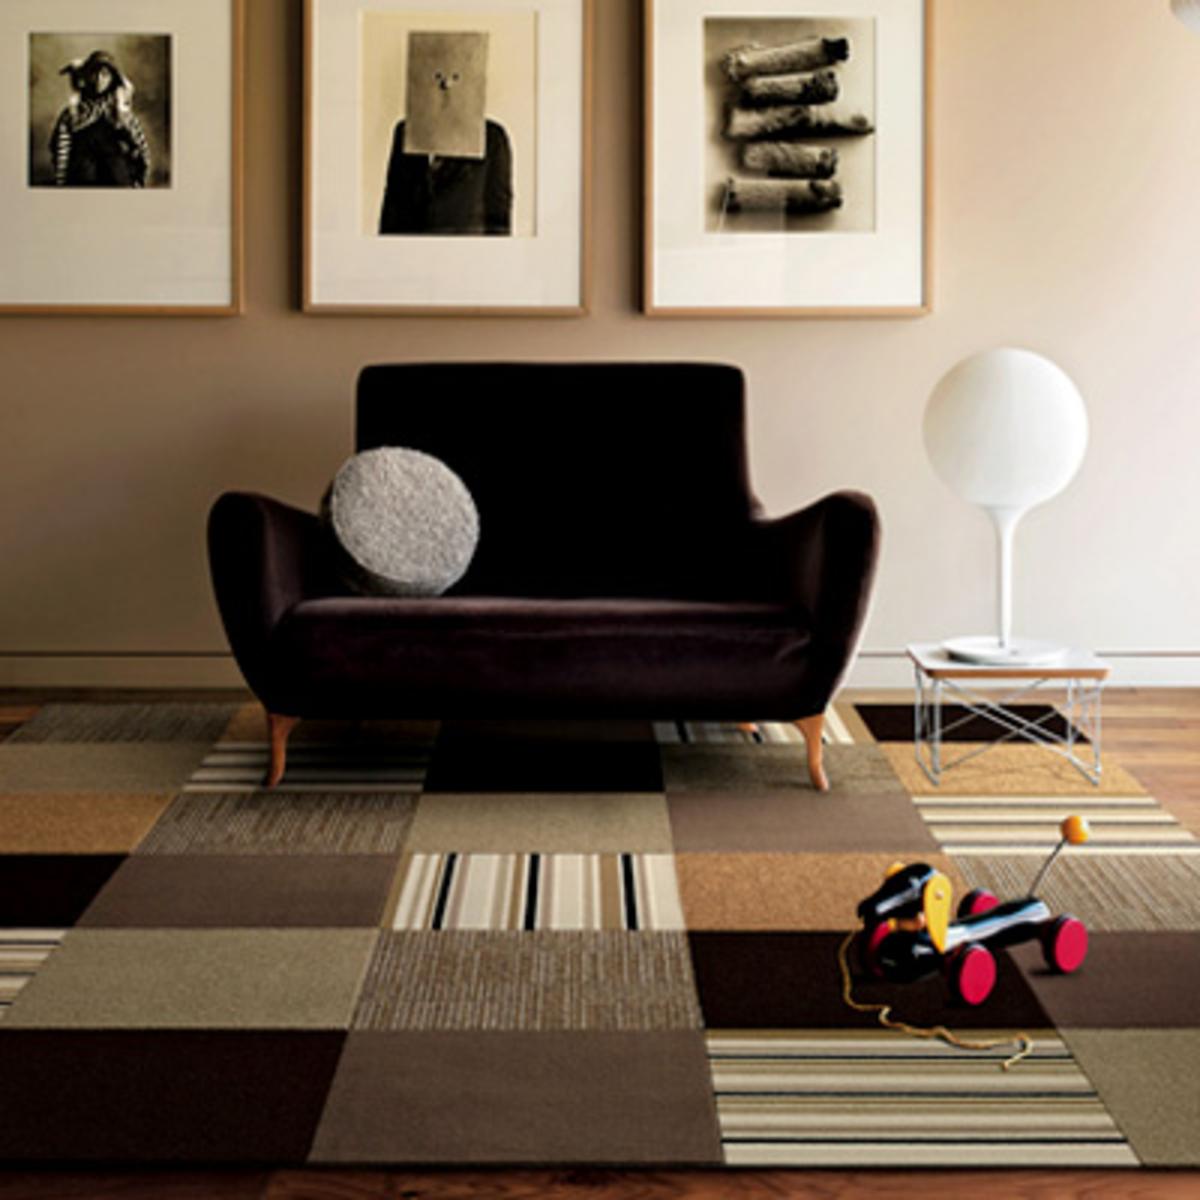 6 Principles Of Design In Interior Home Decoration